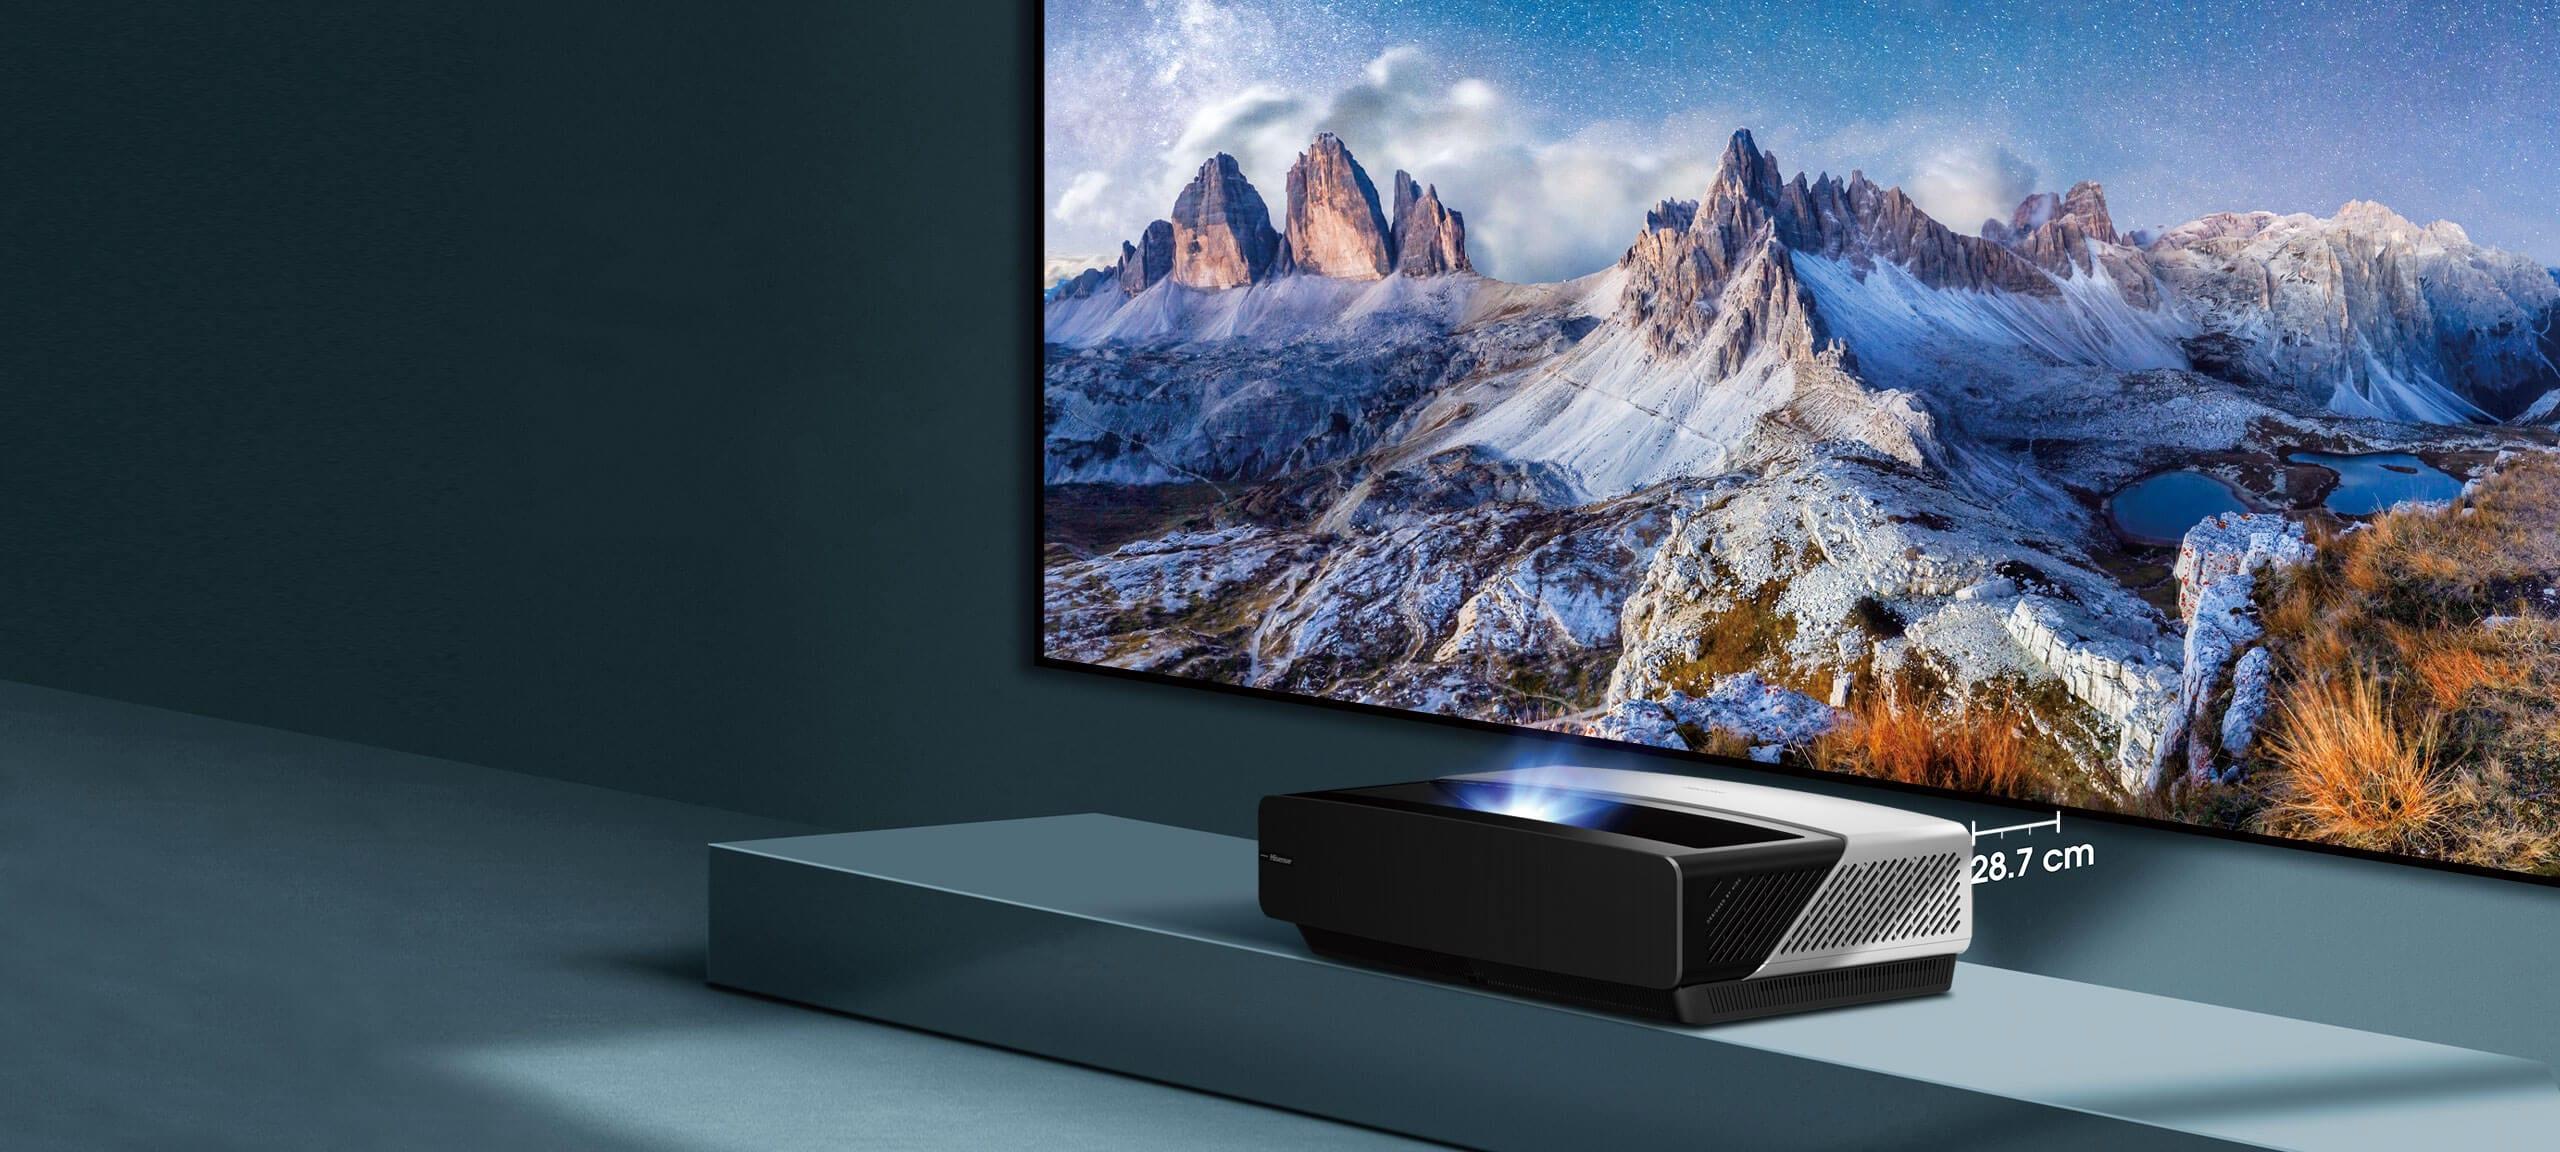 2.-4K-Ultra-Short-Throw-LASER-TV-new-background